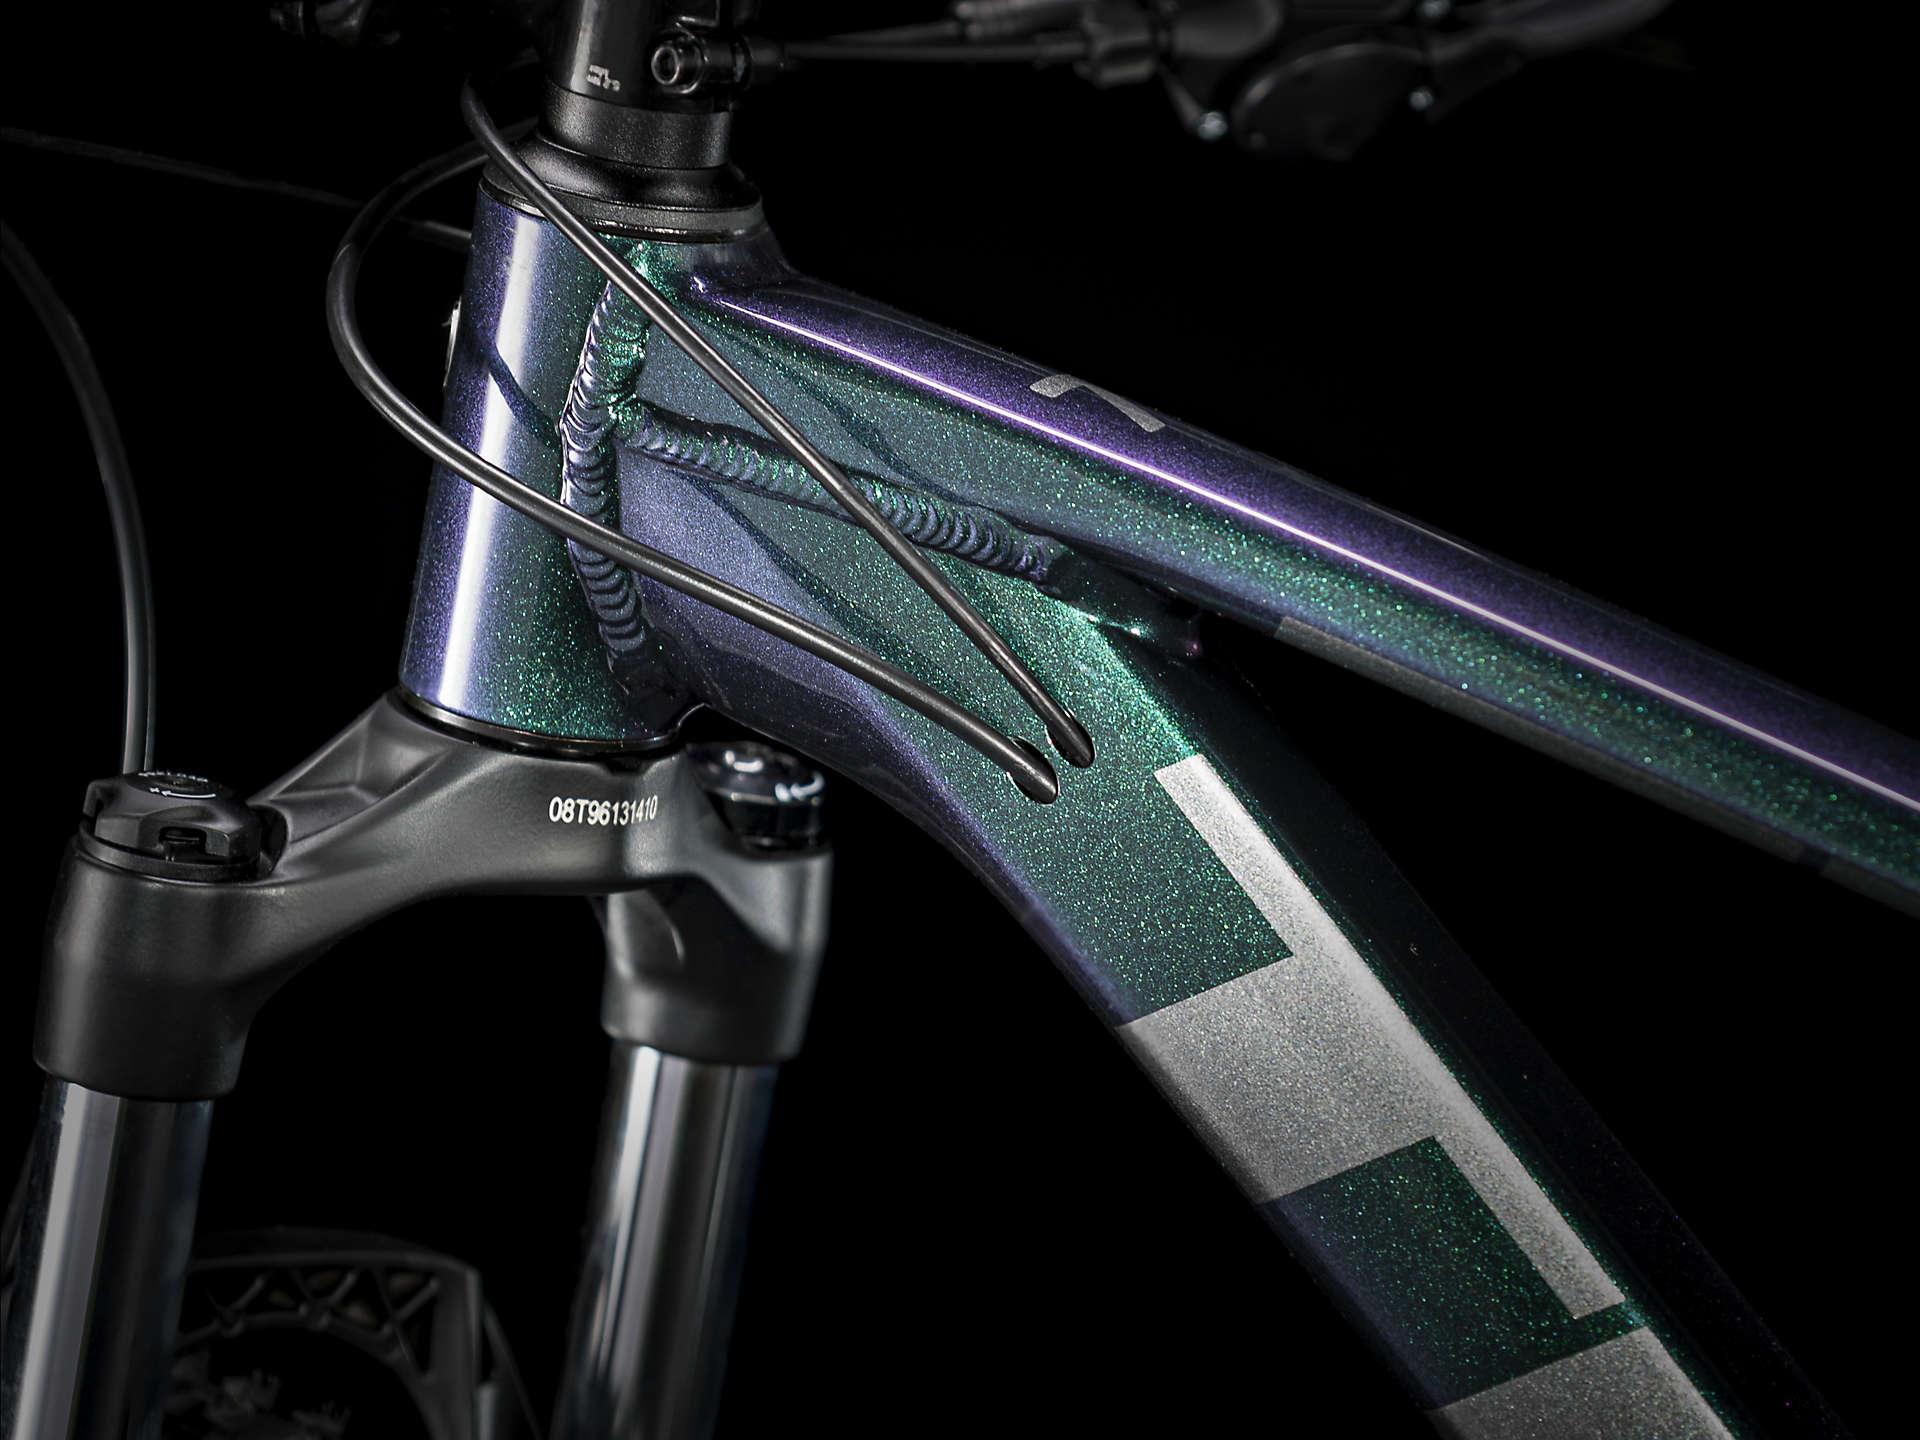 2020 Trek Marlin 7 Hardtail Mountain Bike In Green 163 550 00